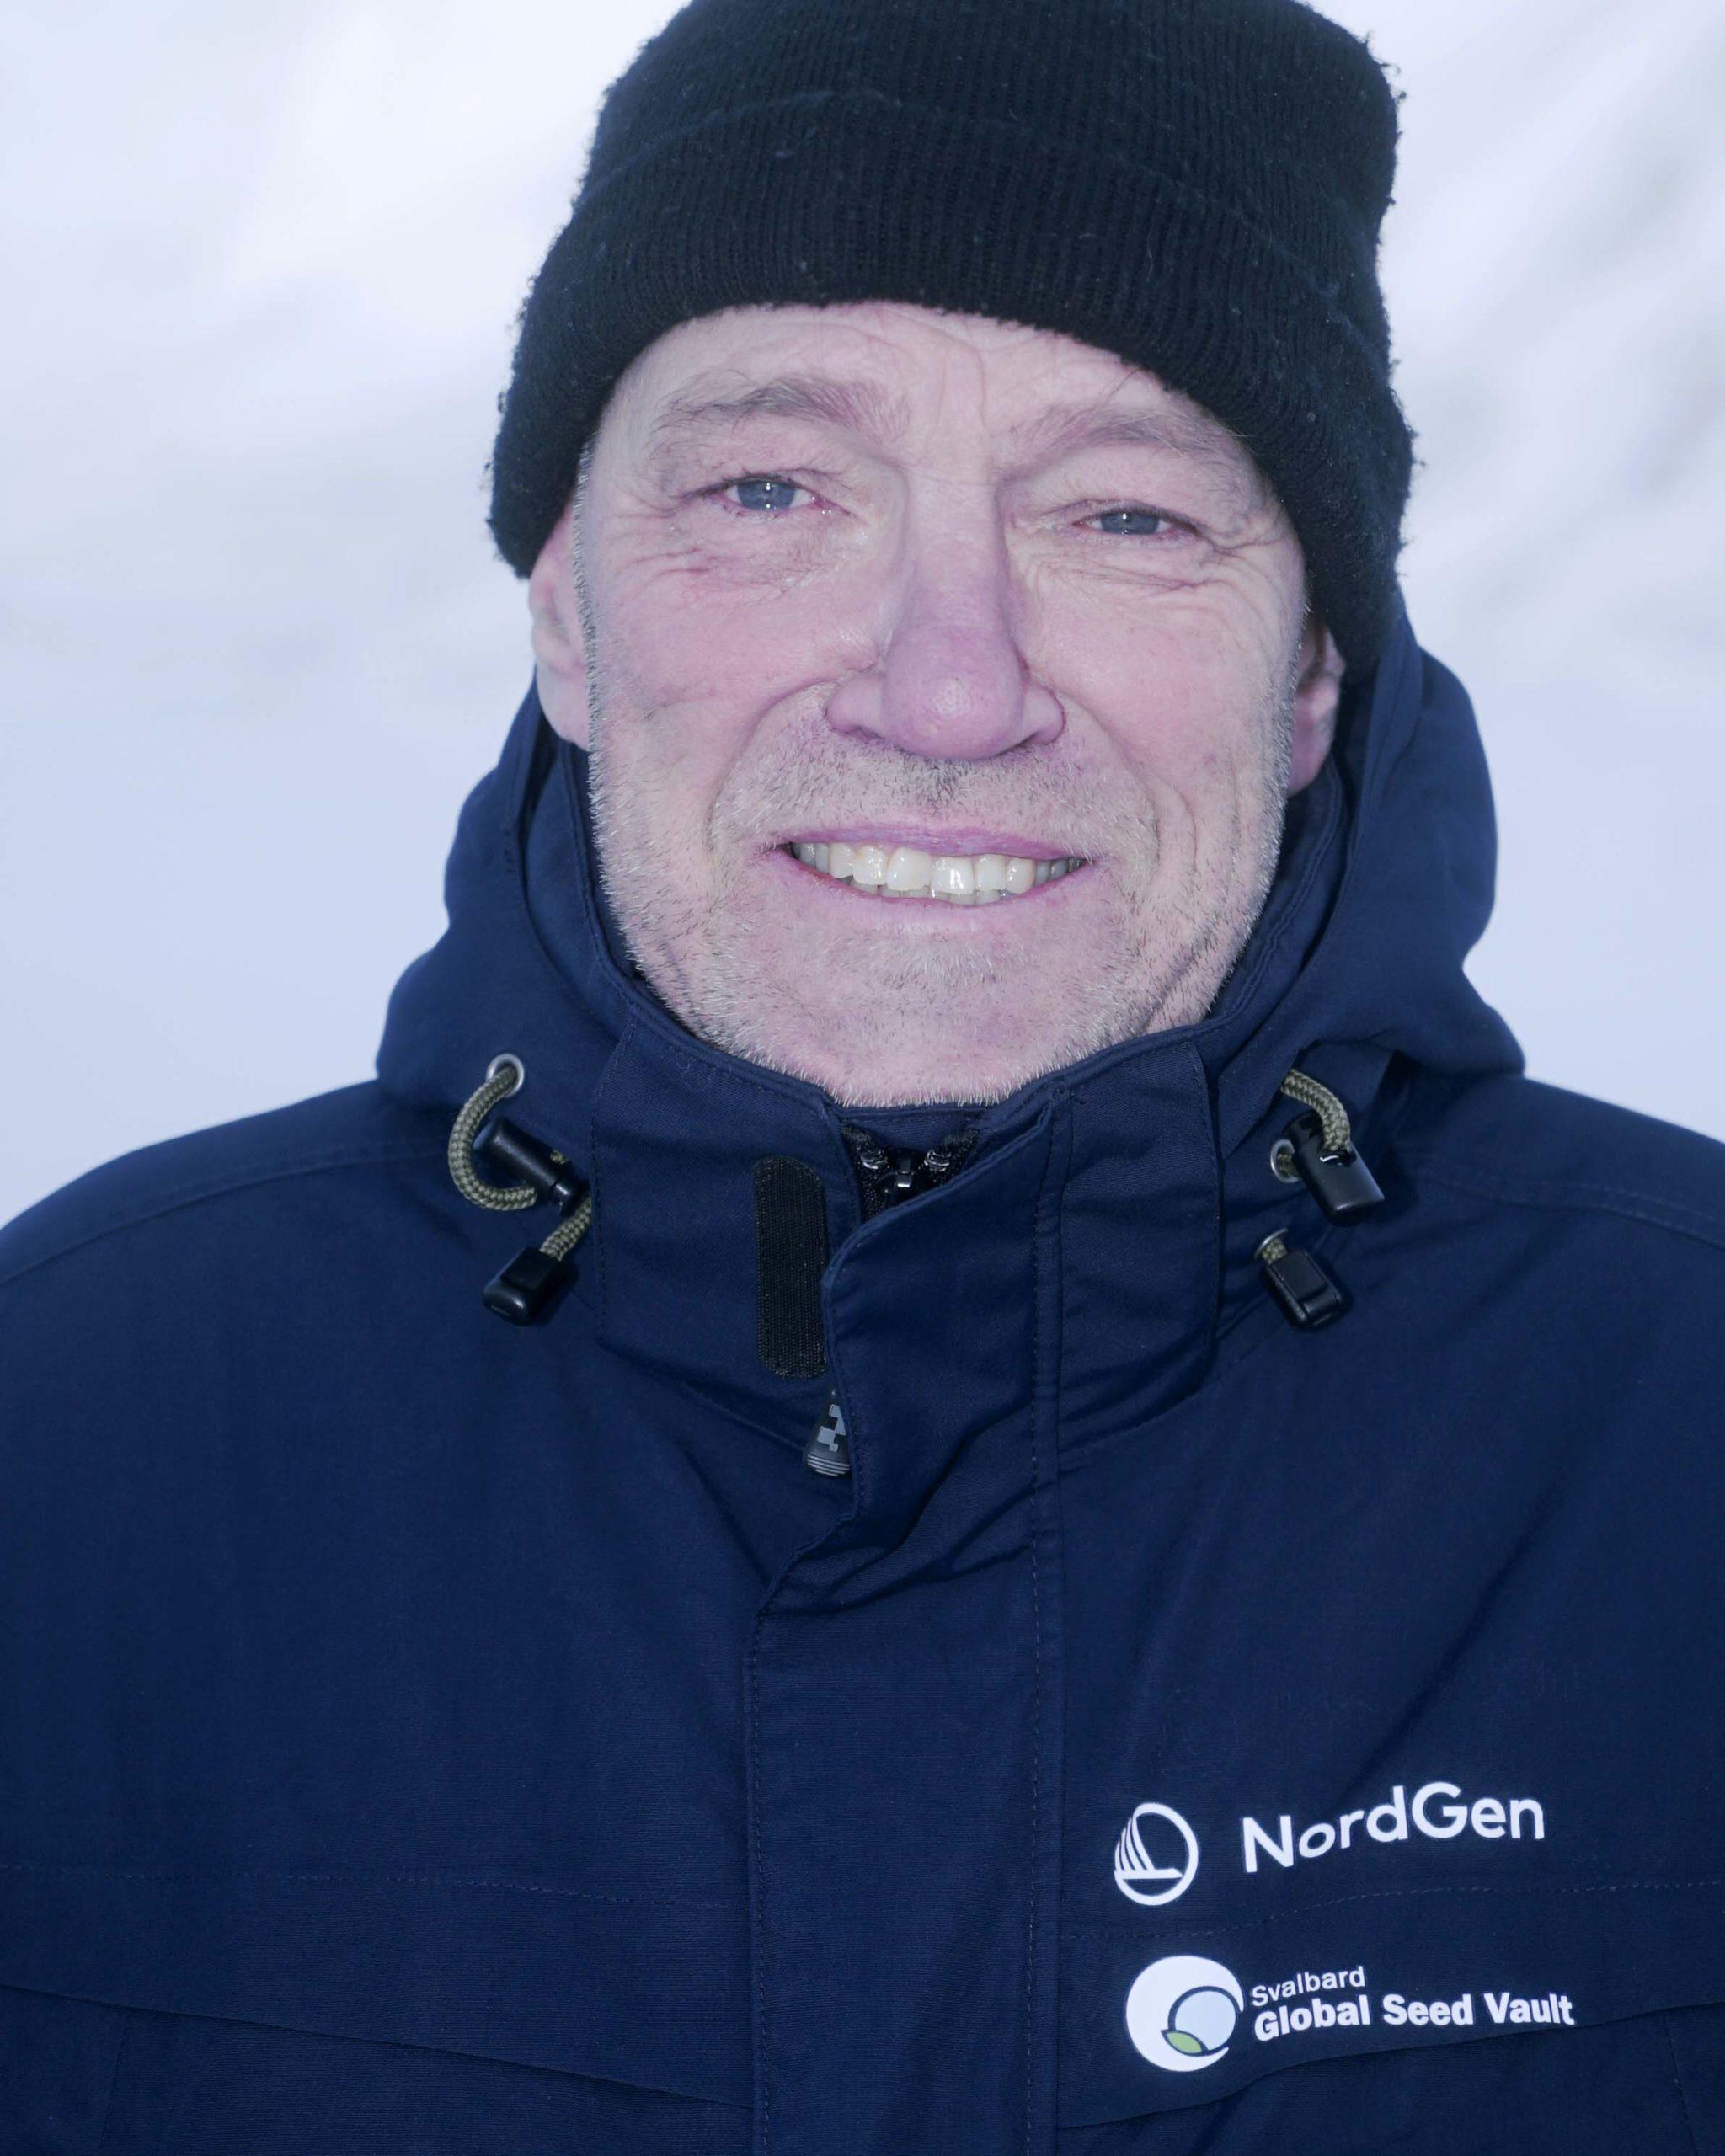 Åsmund Asdal, Seed Vault Coordinator, NordGen